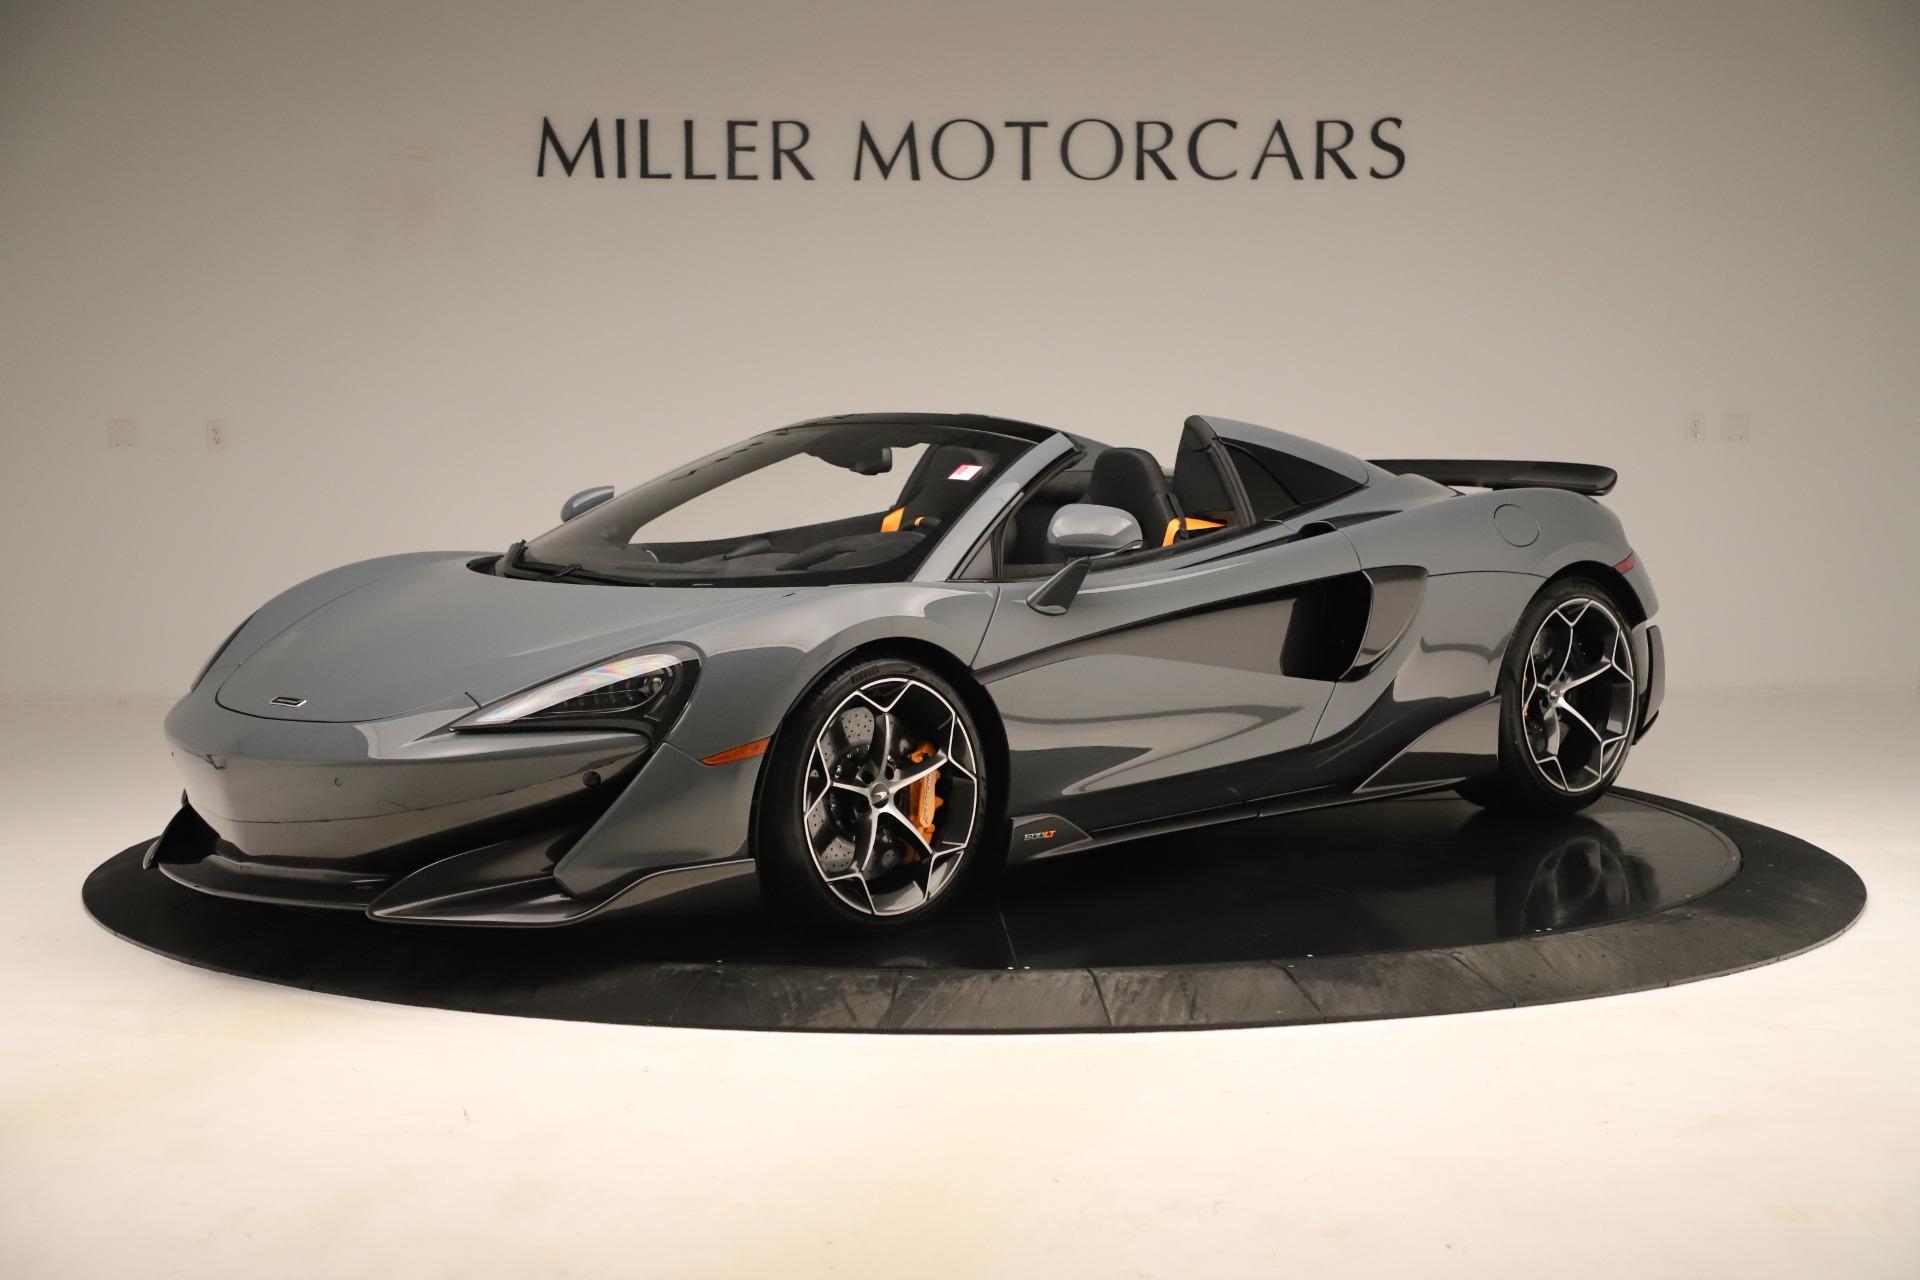 Used 2020 McLaren 600LT Spider for sale Call for price at Alfa Romeo of Westport in Westport CT 06880 1